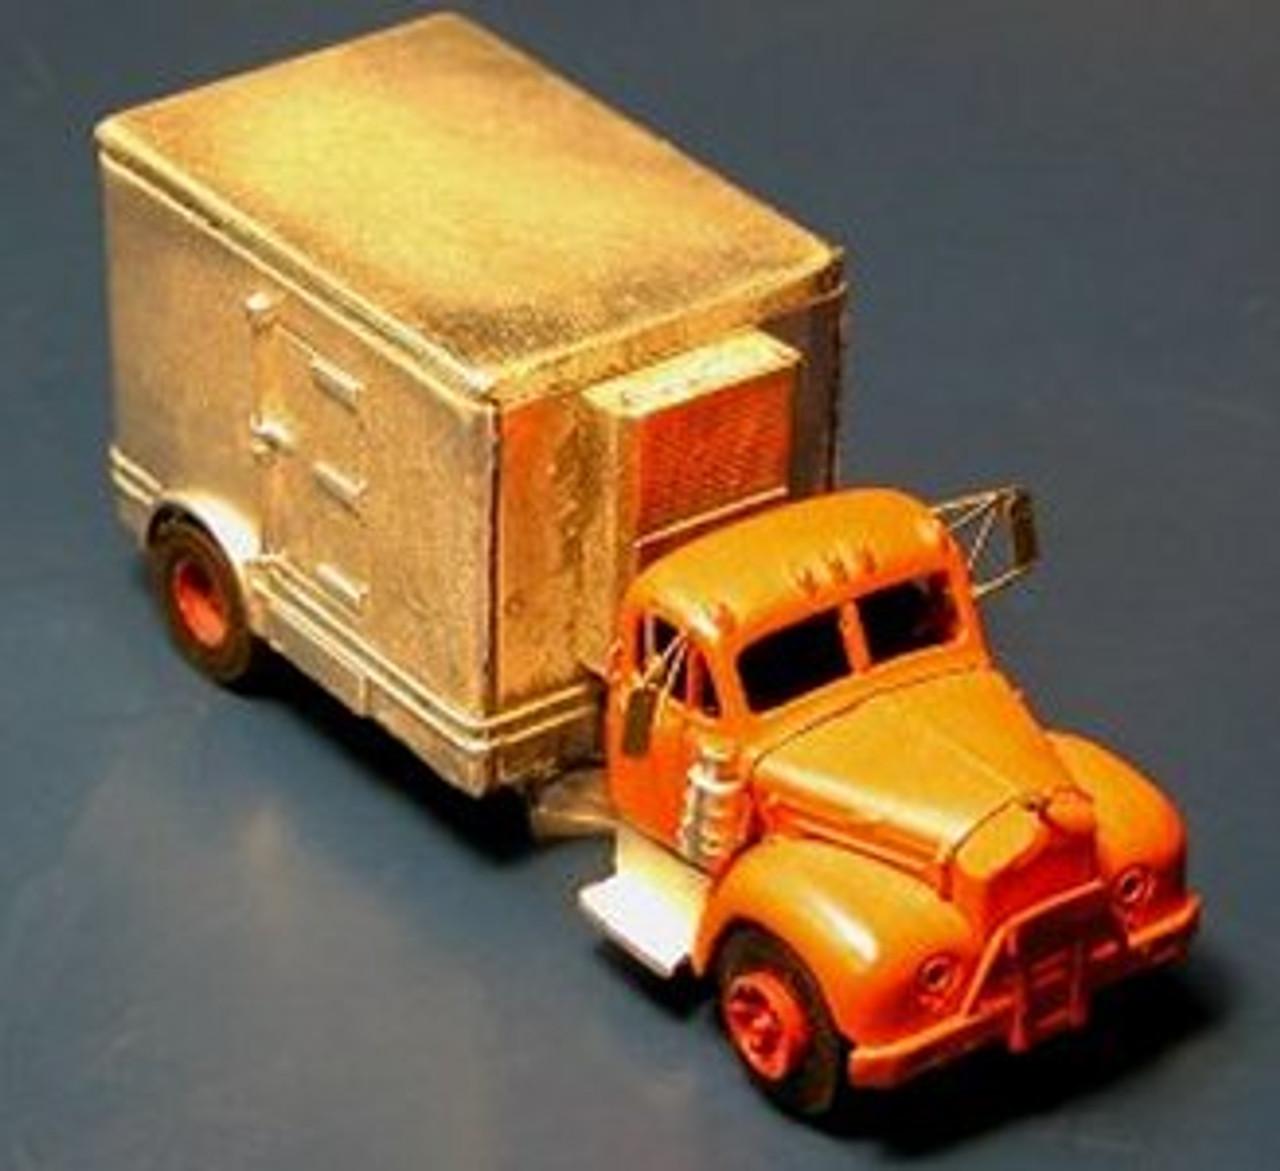 1953-64 Mack B42 / B61 Truck with Refrigerated Van Body Kit